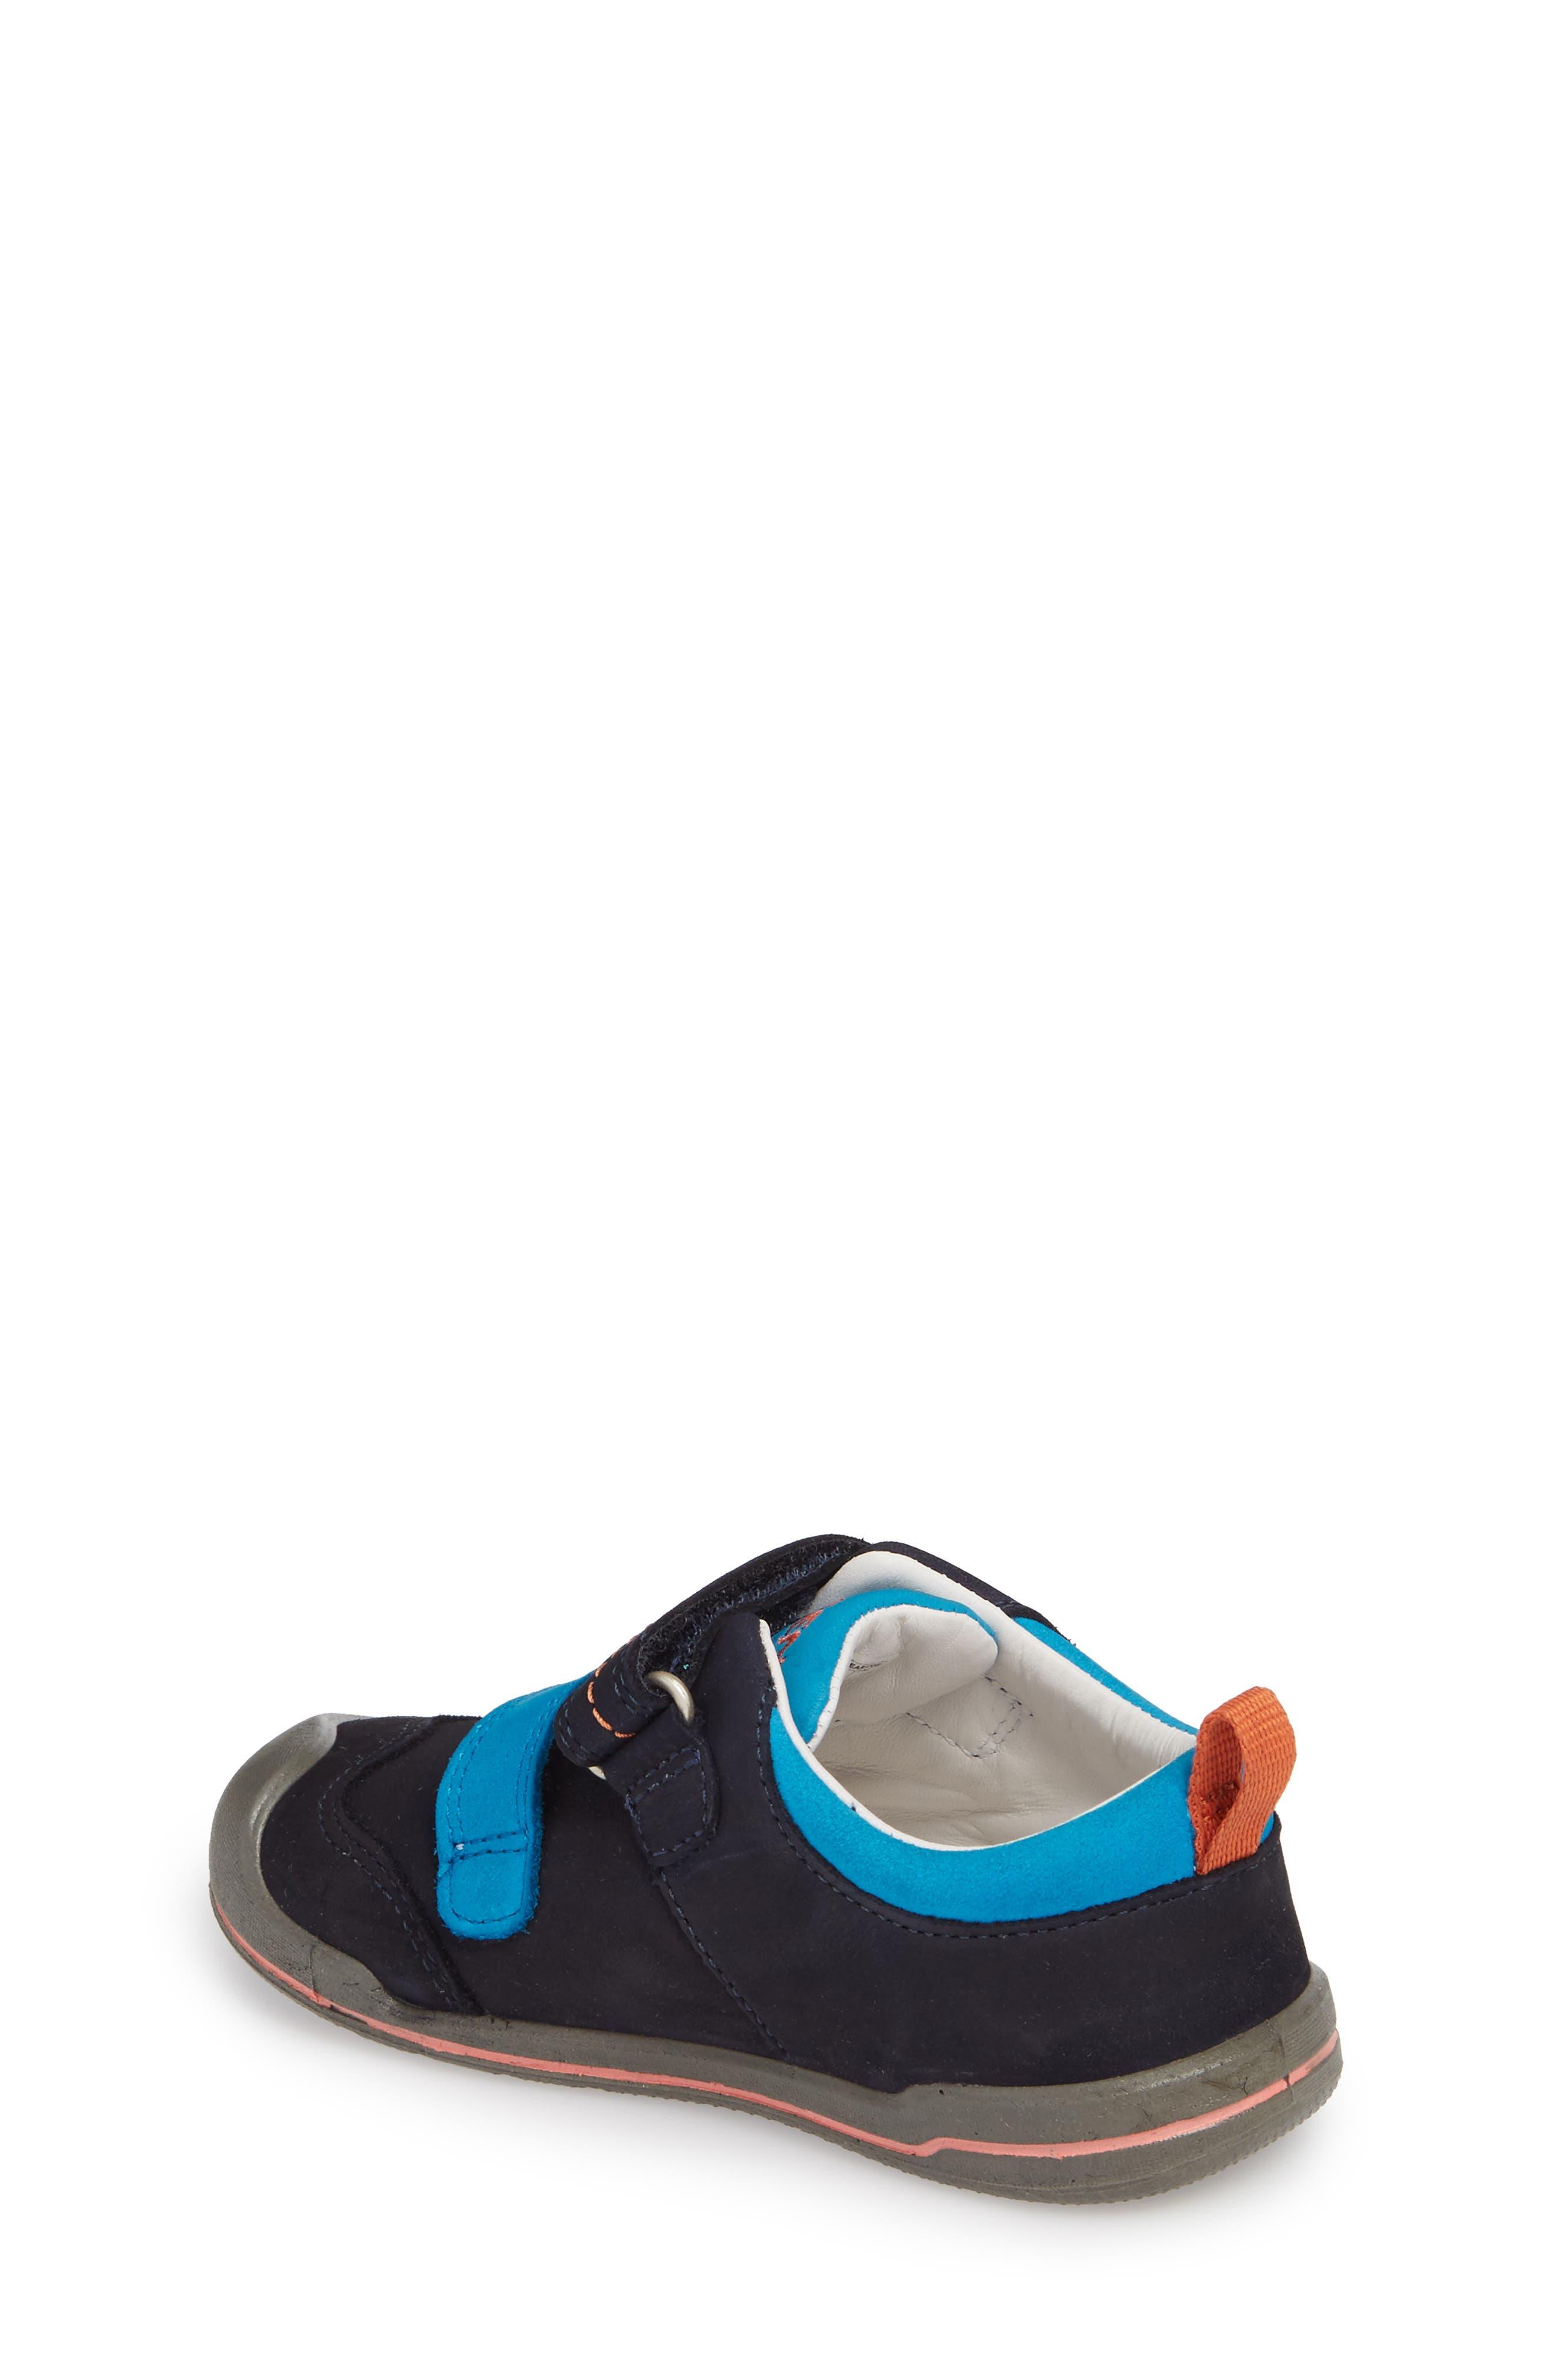 Sprout Double Strap Sneaker,                             Alternate thumbnail 2, color,                             DRESS BLUES/ KOI